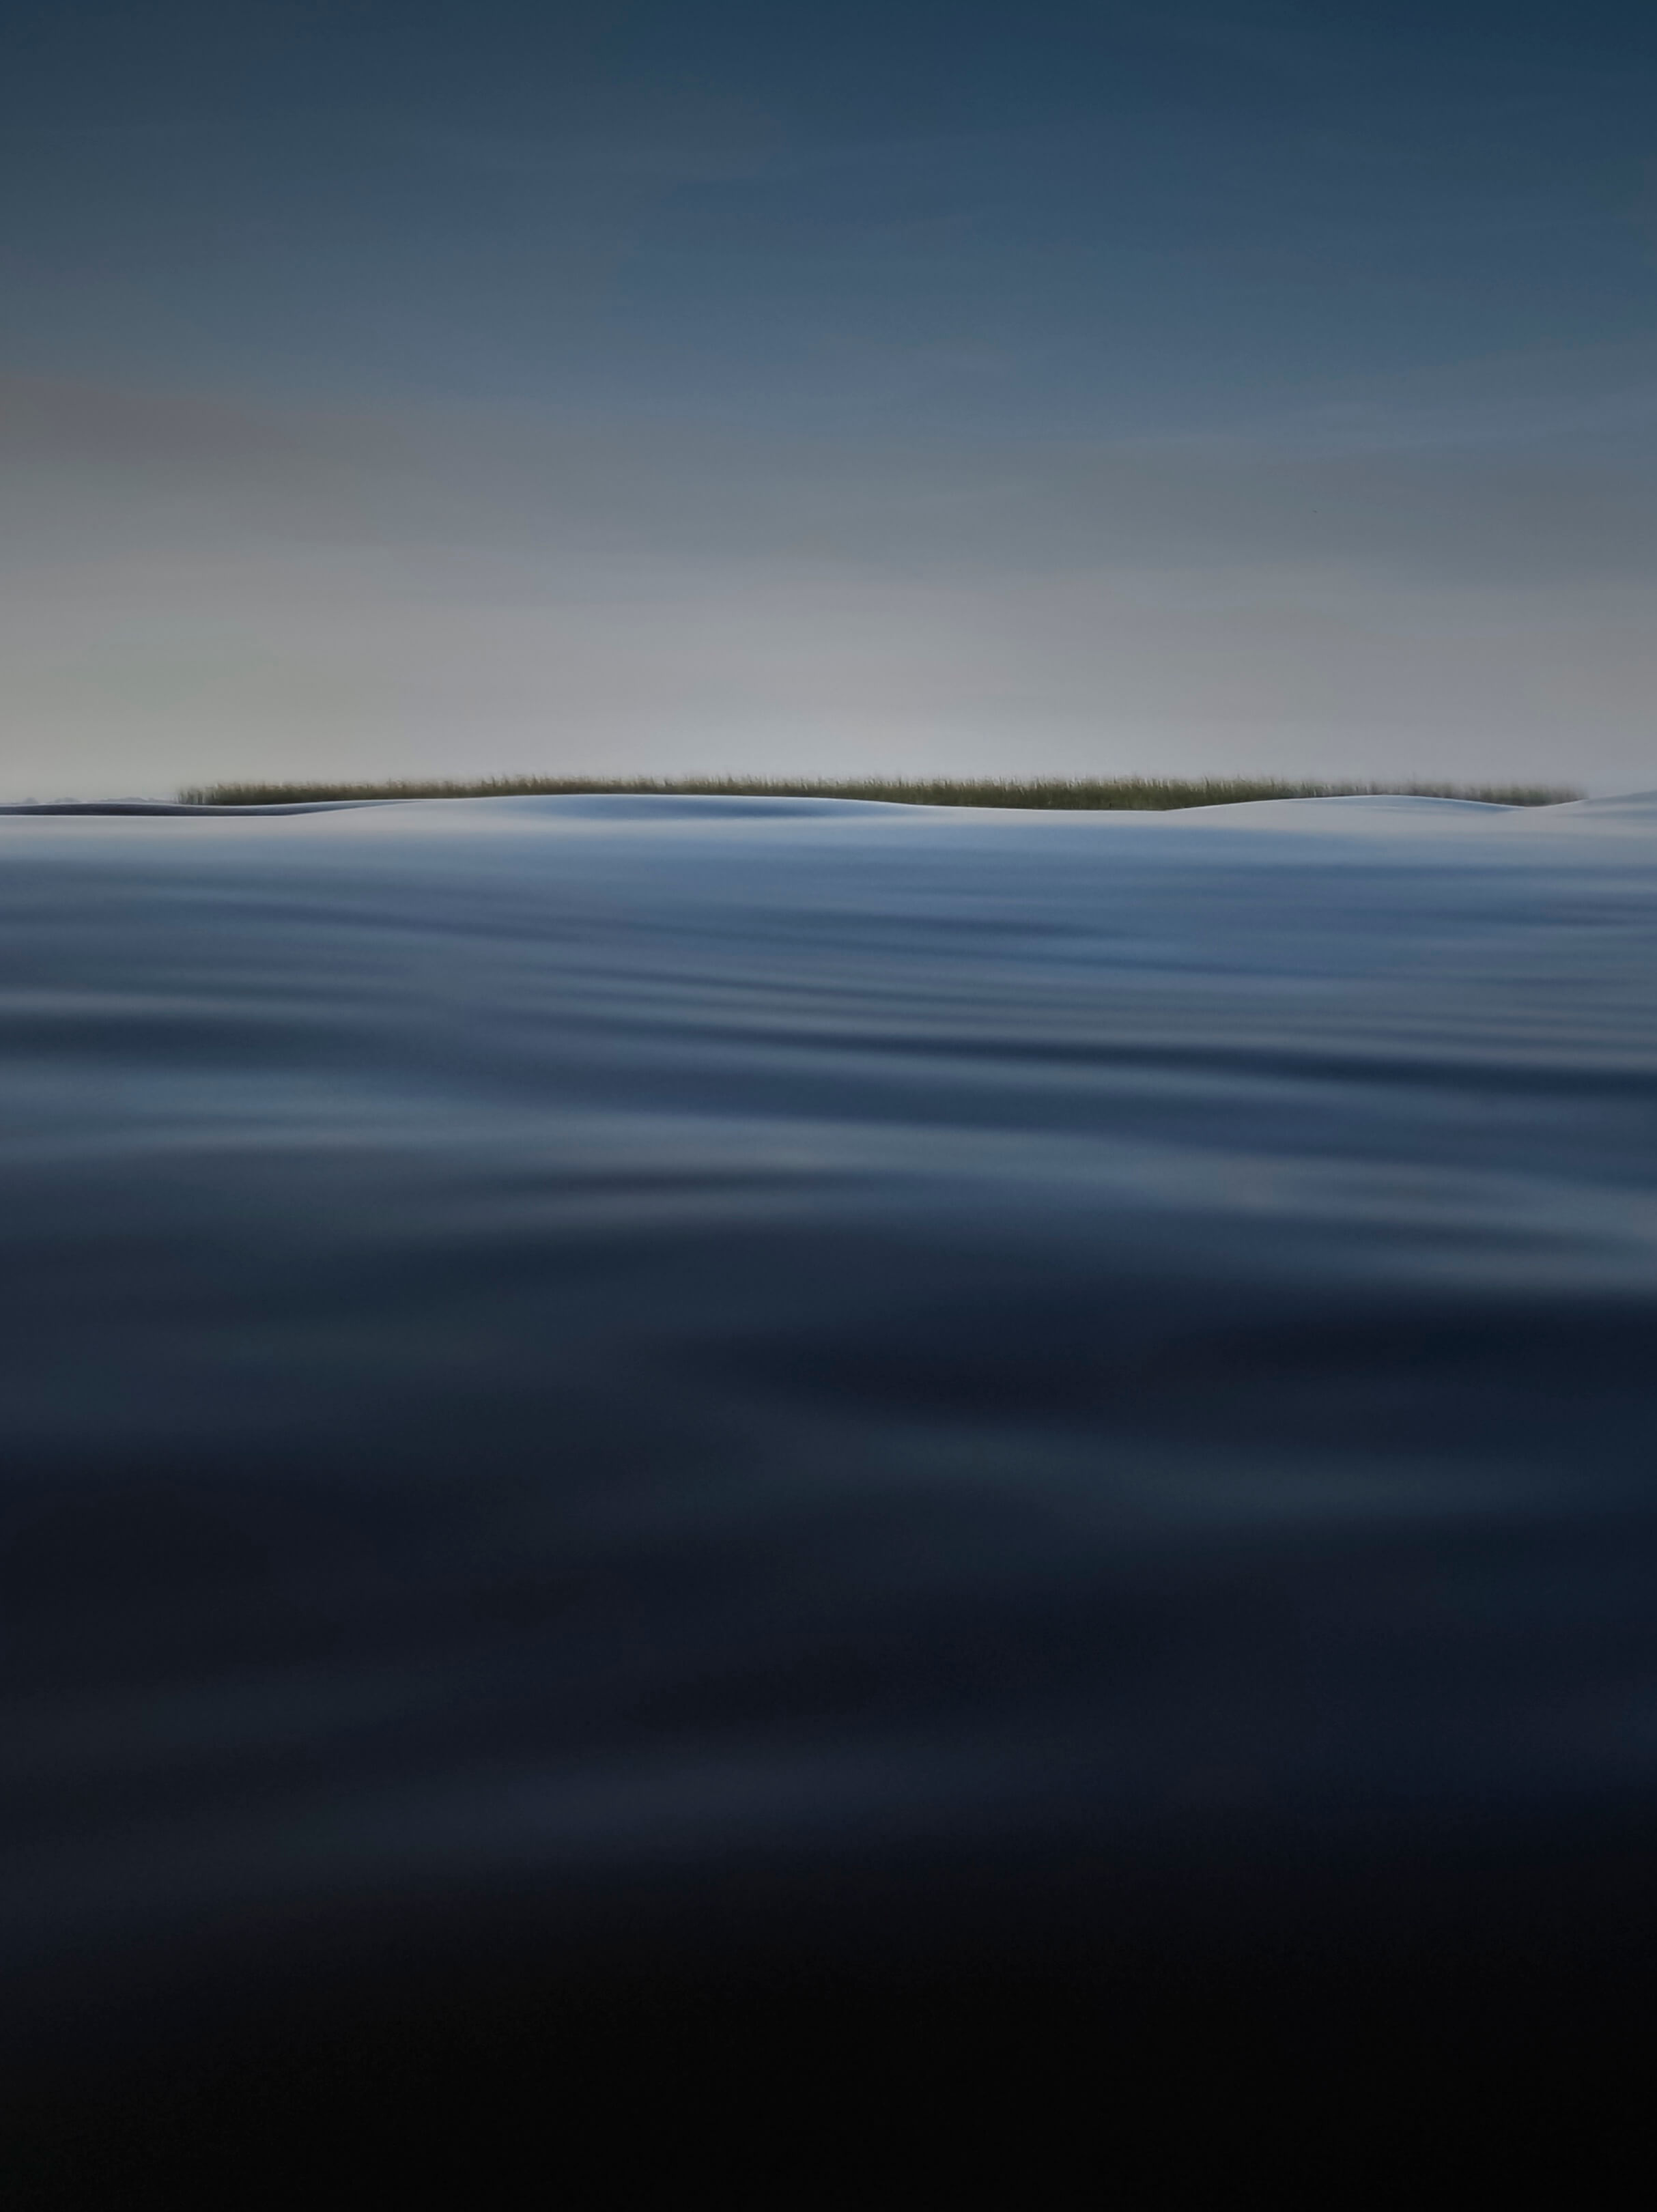 Jur Jurjen Poeles fotografie landschap dageraad natuur water kunst kunstfotografie